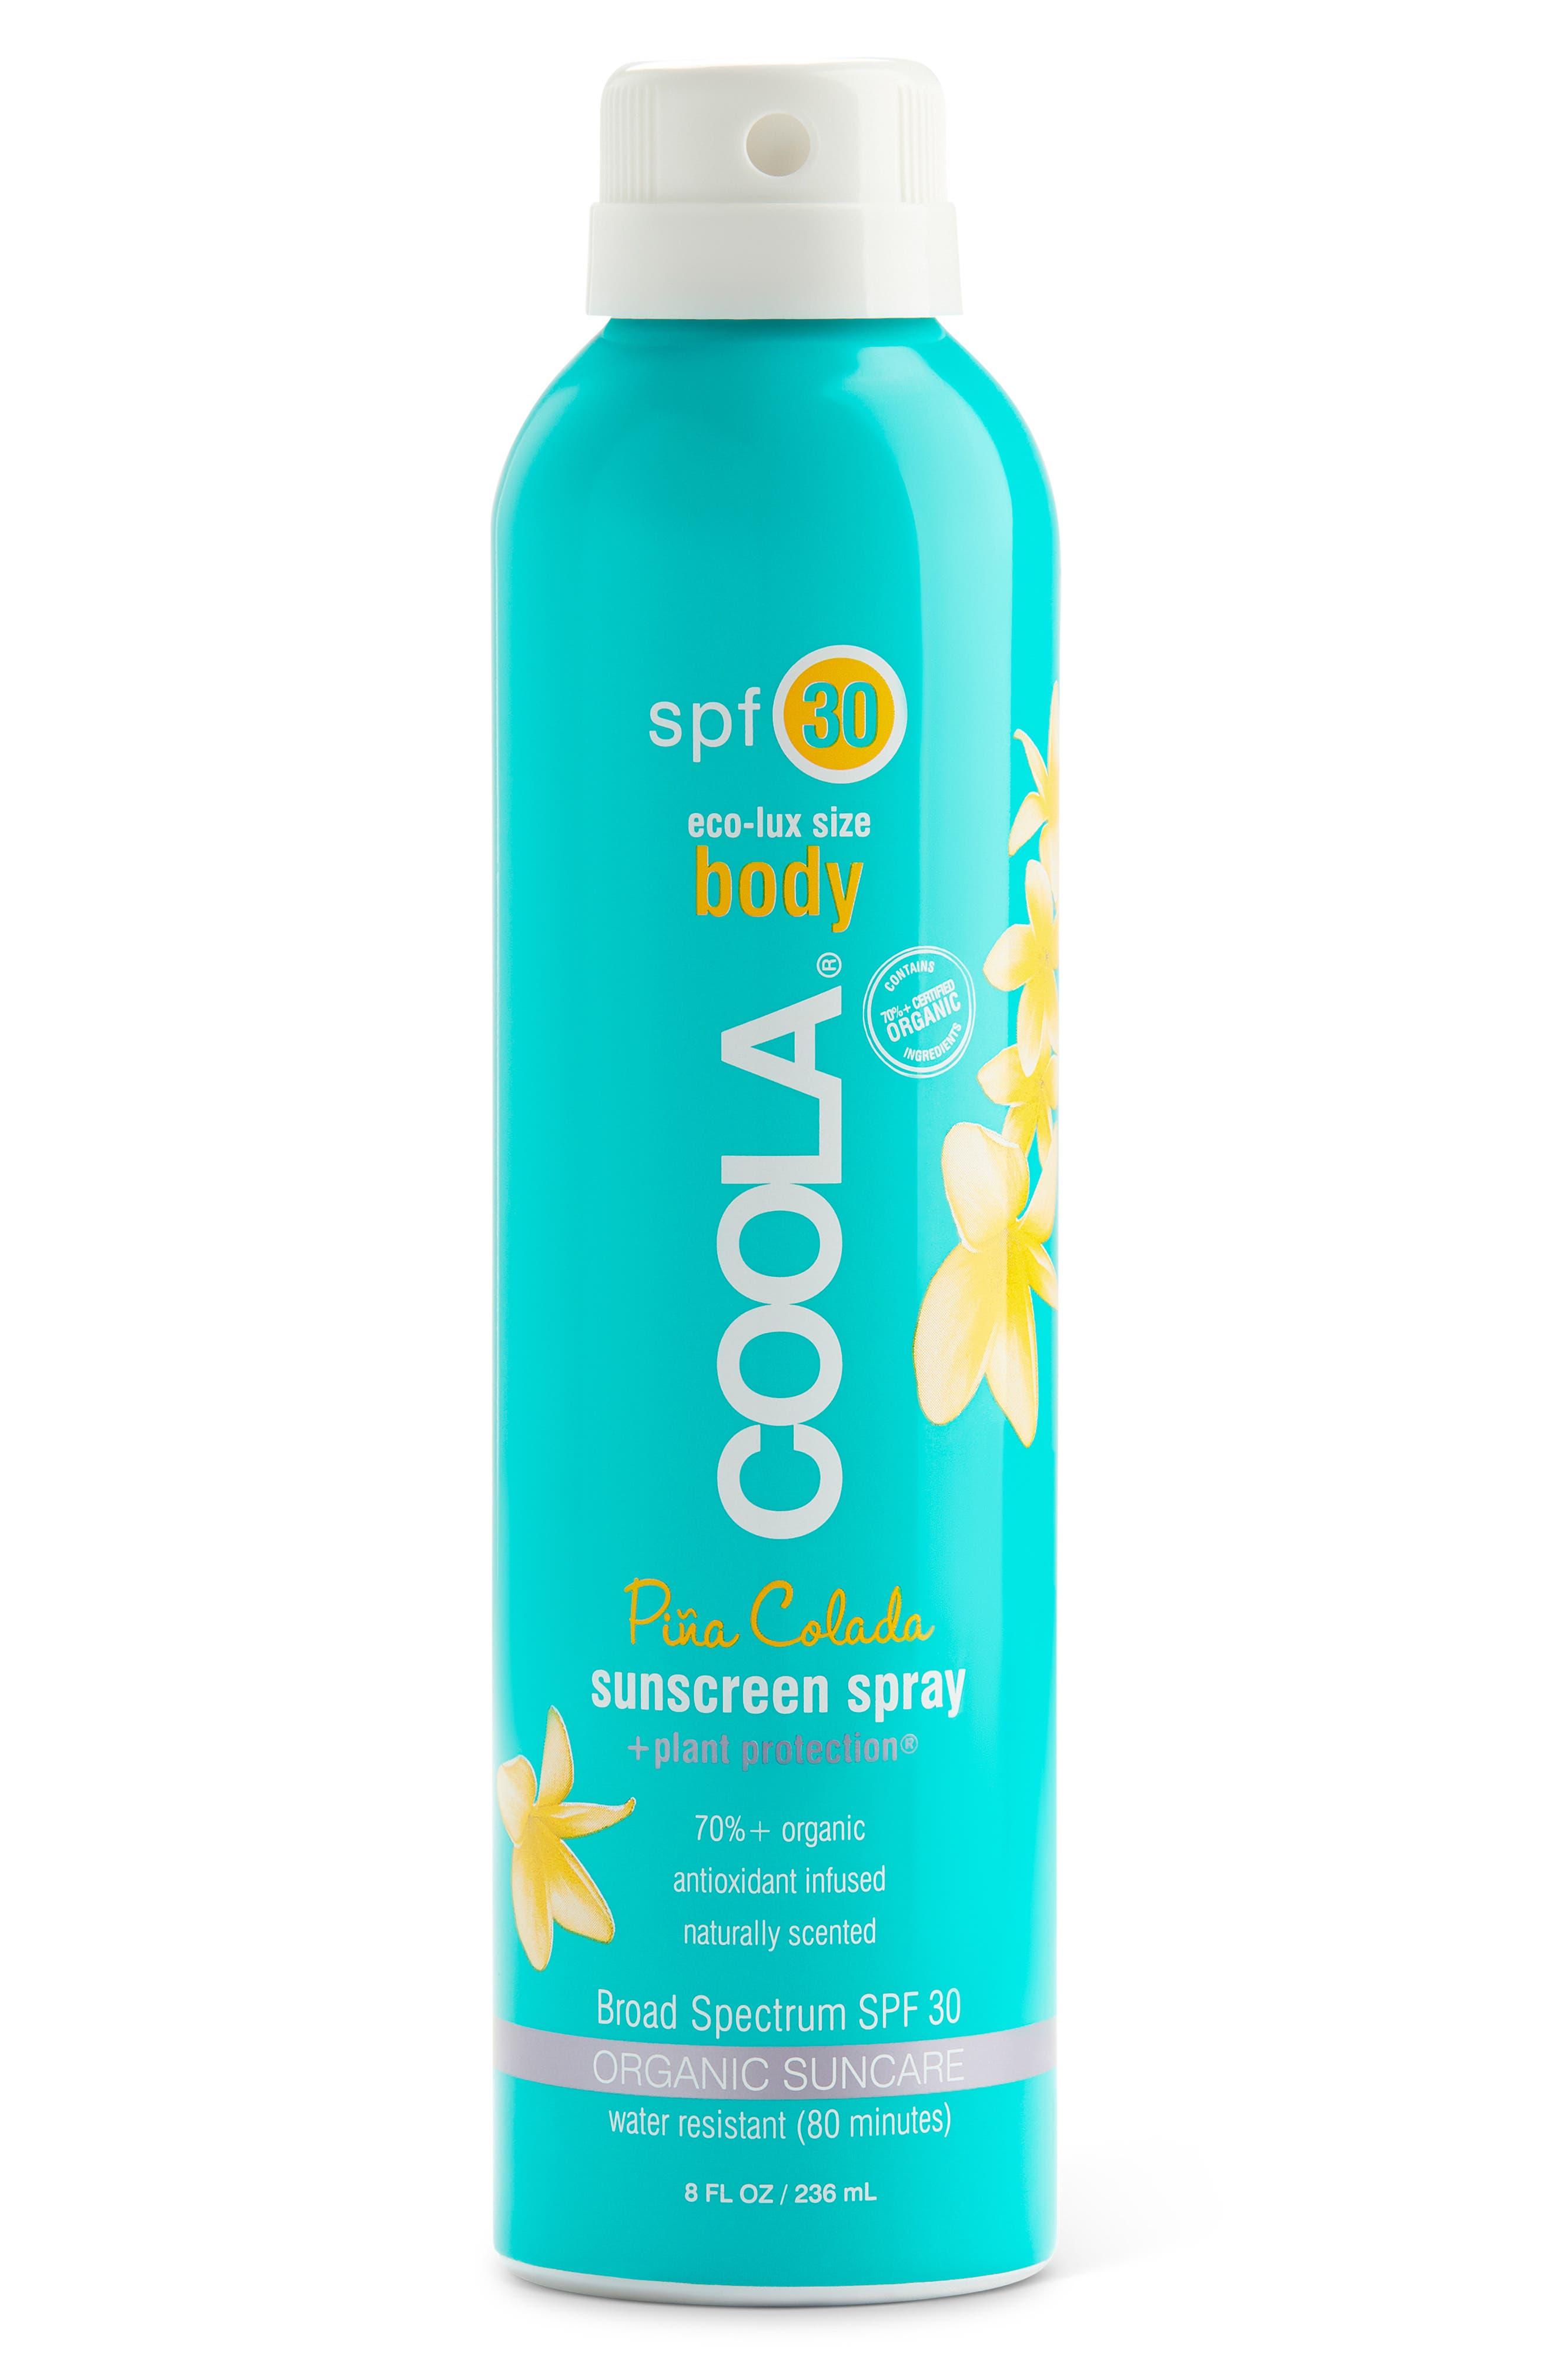 Coola Suncare Sport Sunscreen Spray Broad Spectrum Spf 30